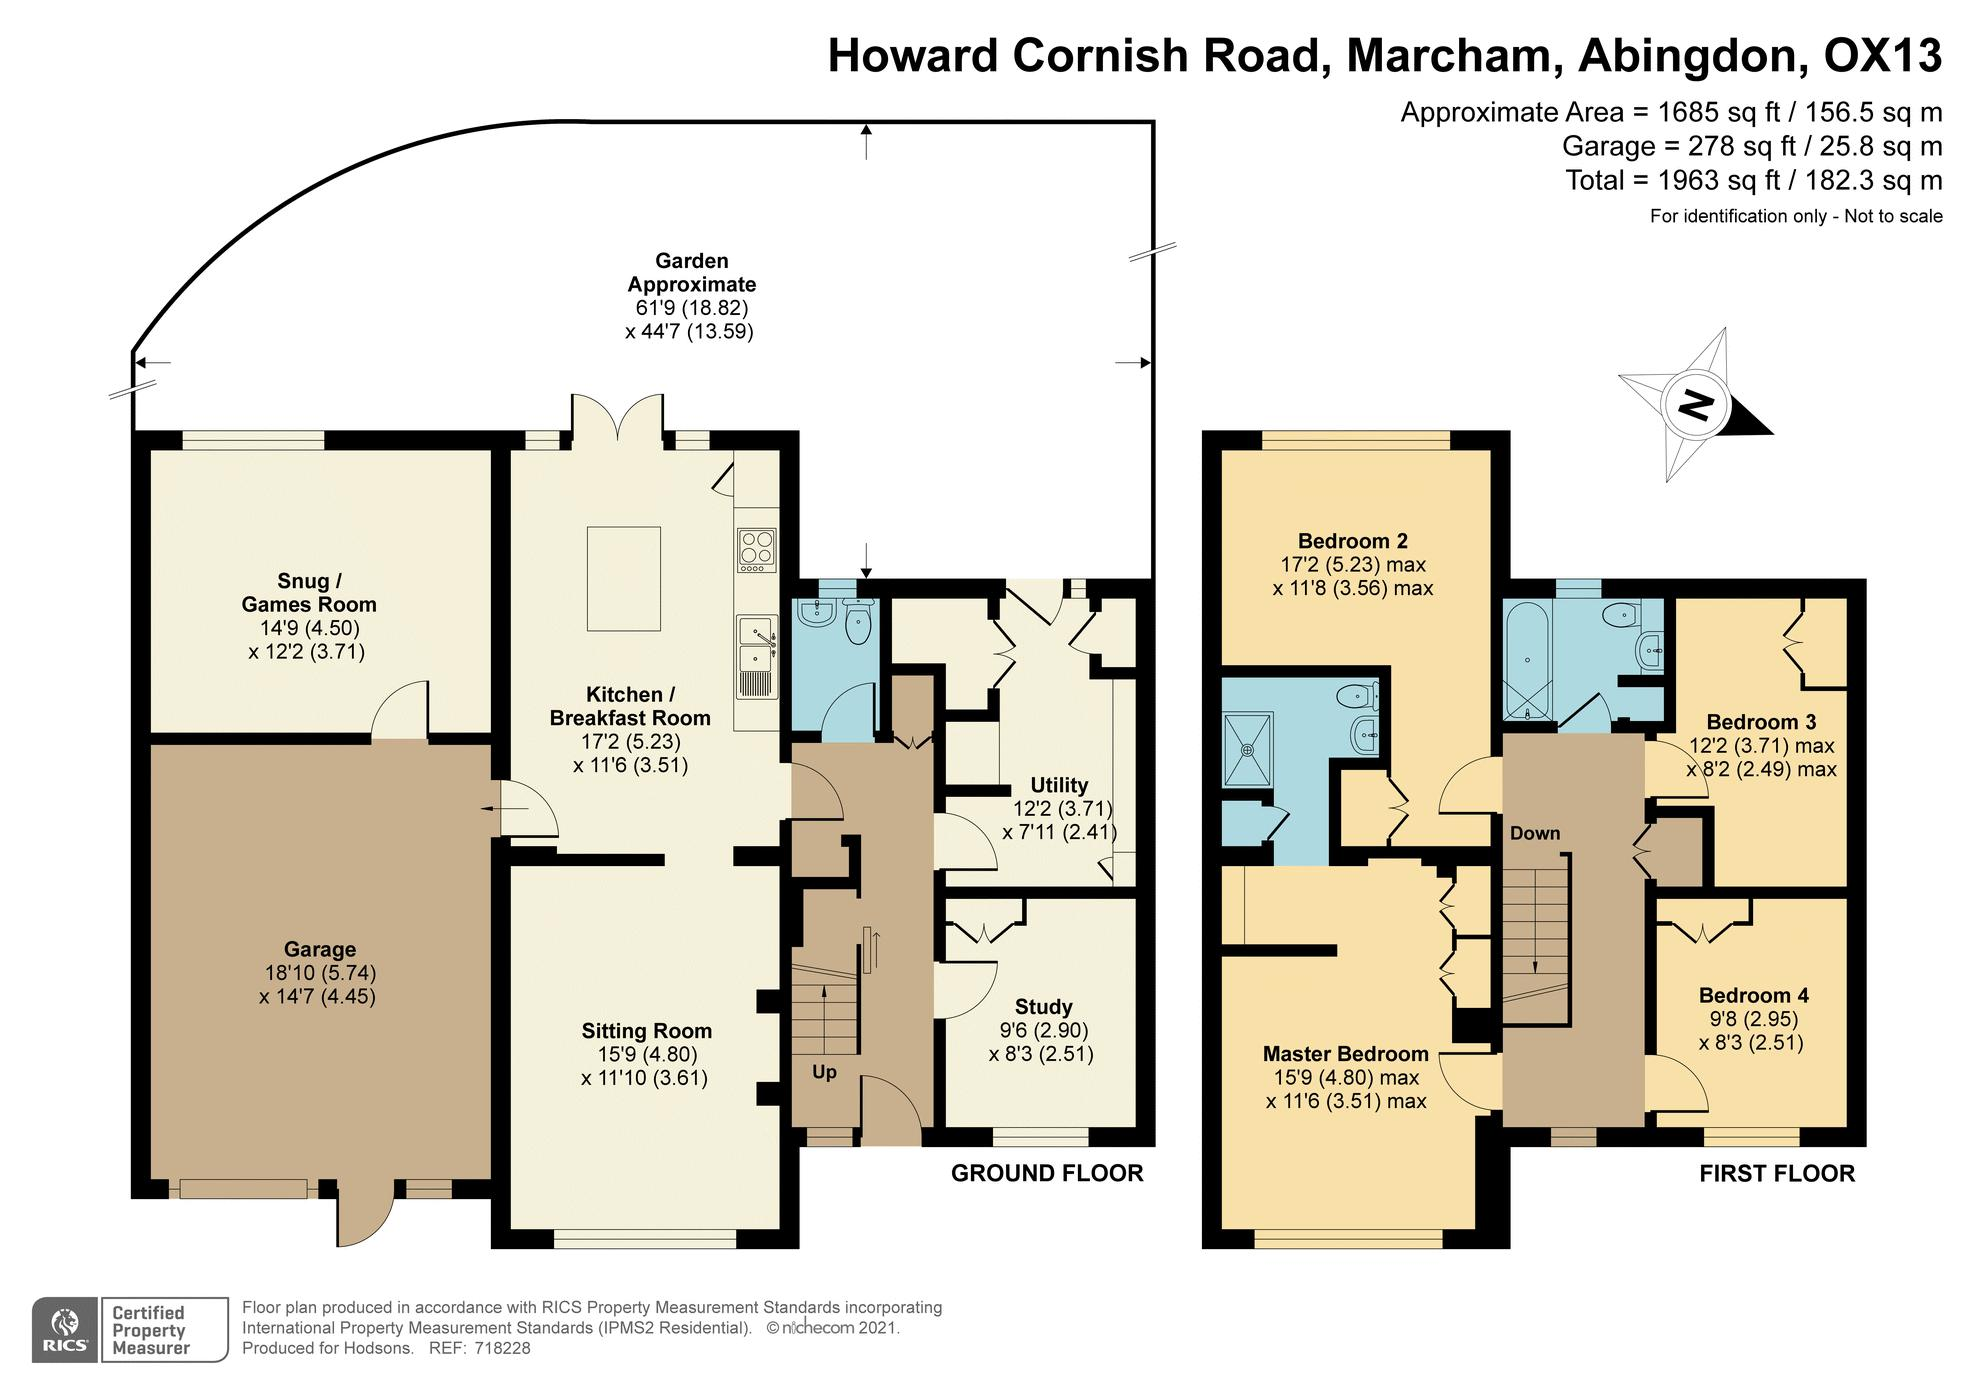 Howard Cornish Road Marcham